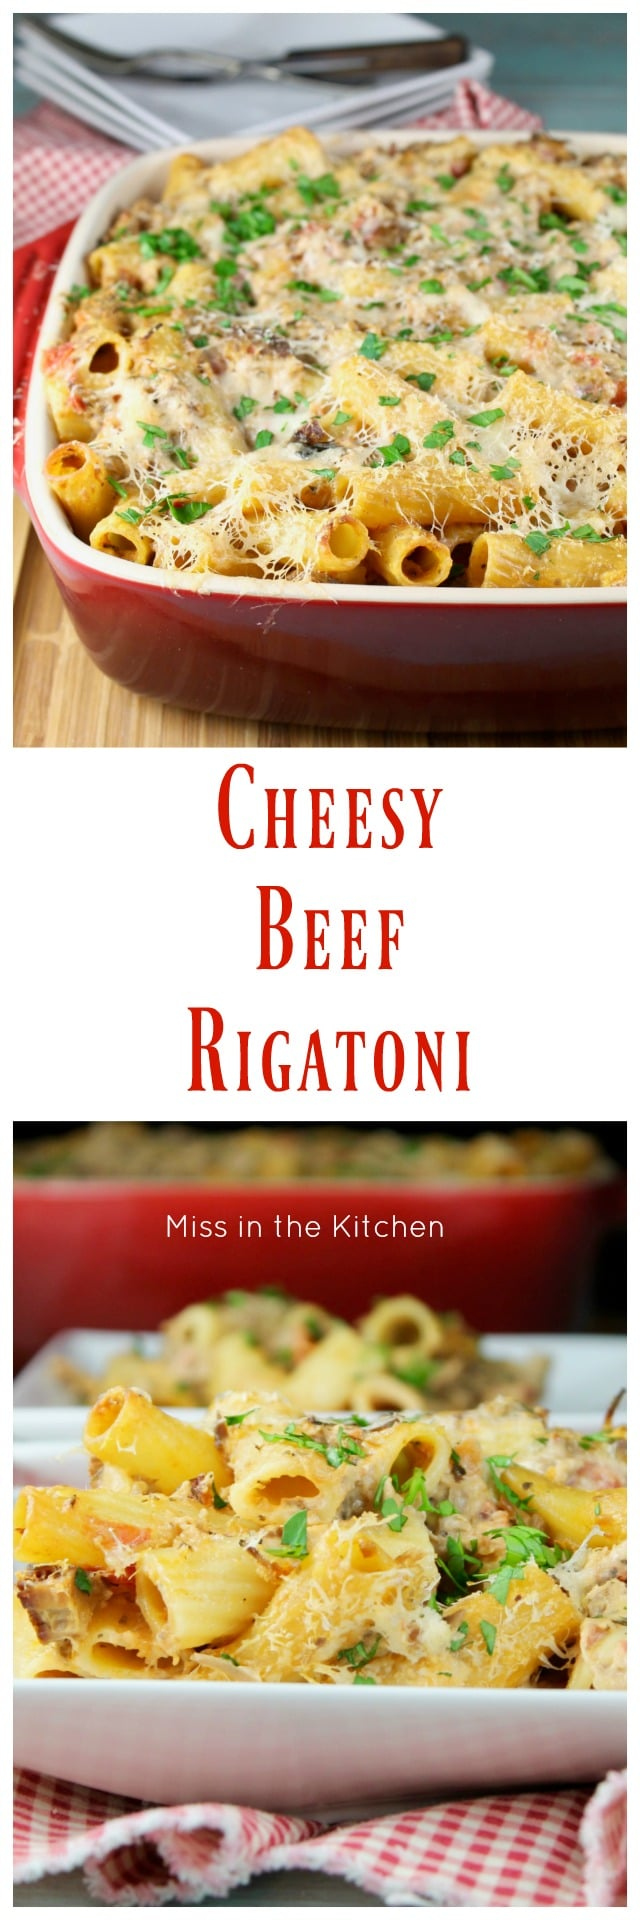 Cheesy Beef Rigatoni Recipe ~ MissintheKitchen.com ~ easy dinner recipe | beef recipe | Pasta casserole